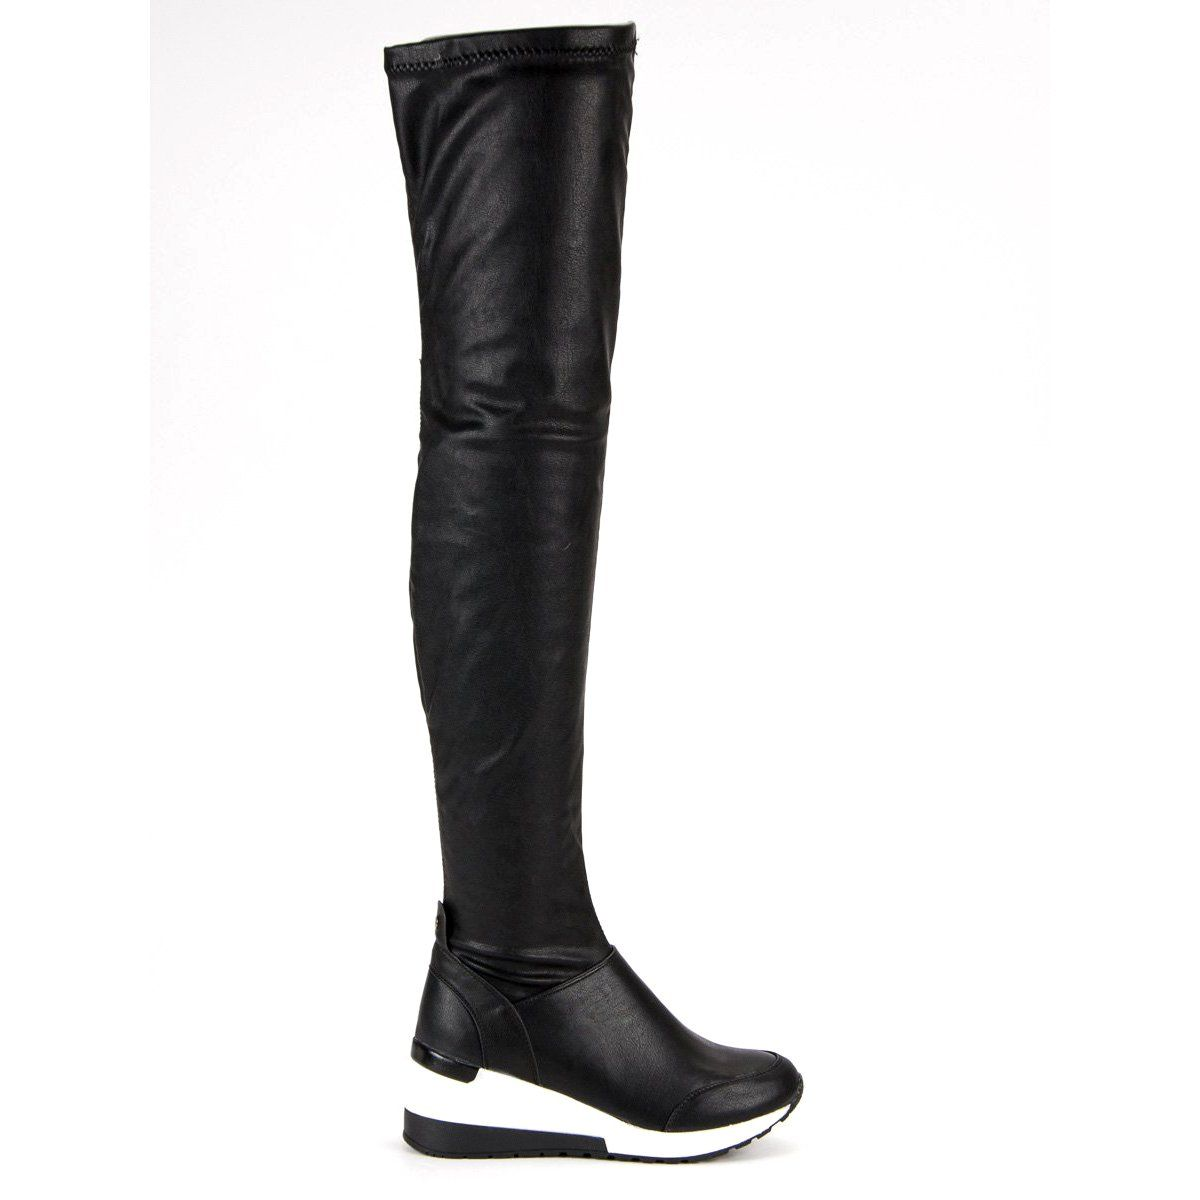 Sds Sportowe Kozaki Na Koturnie Czarne Boots Over Knee Boot Shoes